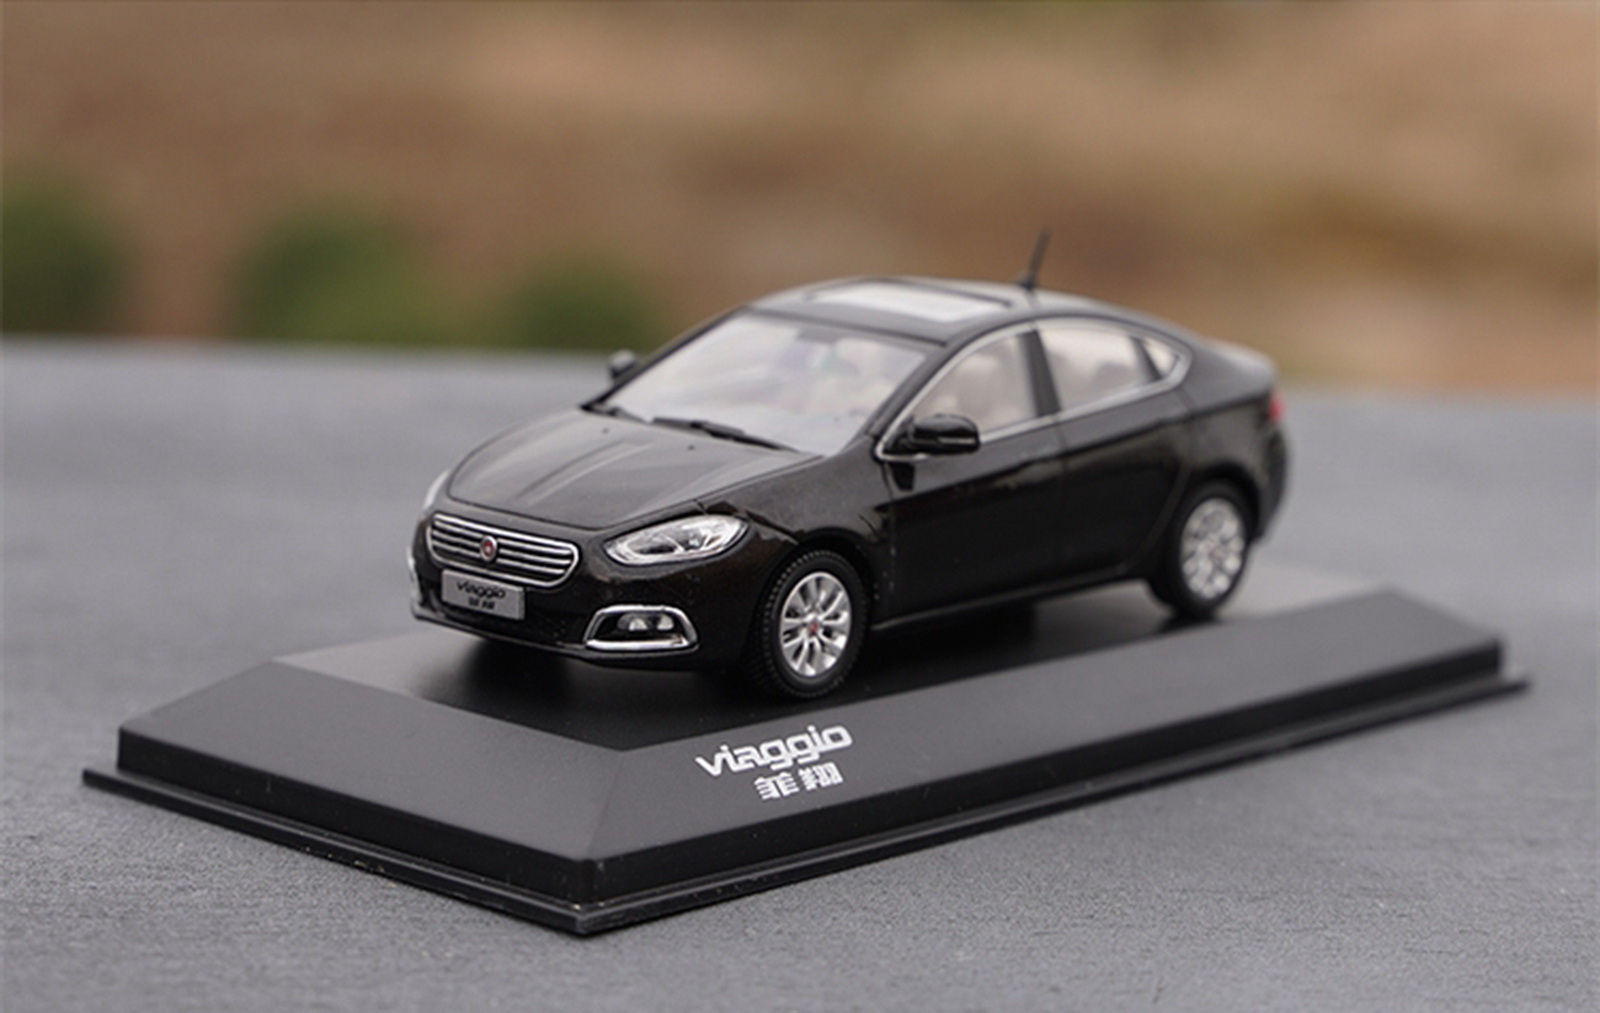 1/43 Scale Fiat viaggio Black Diecast Car Model Toy Collection Gift NIB